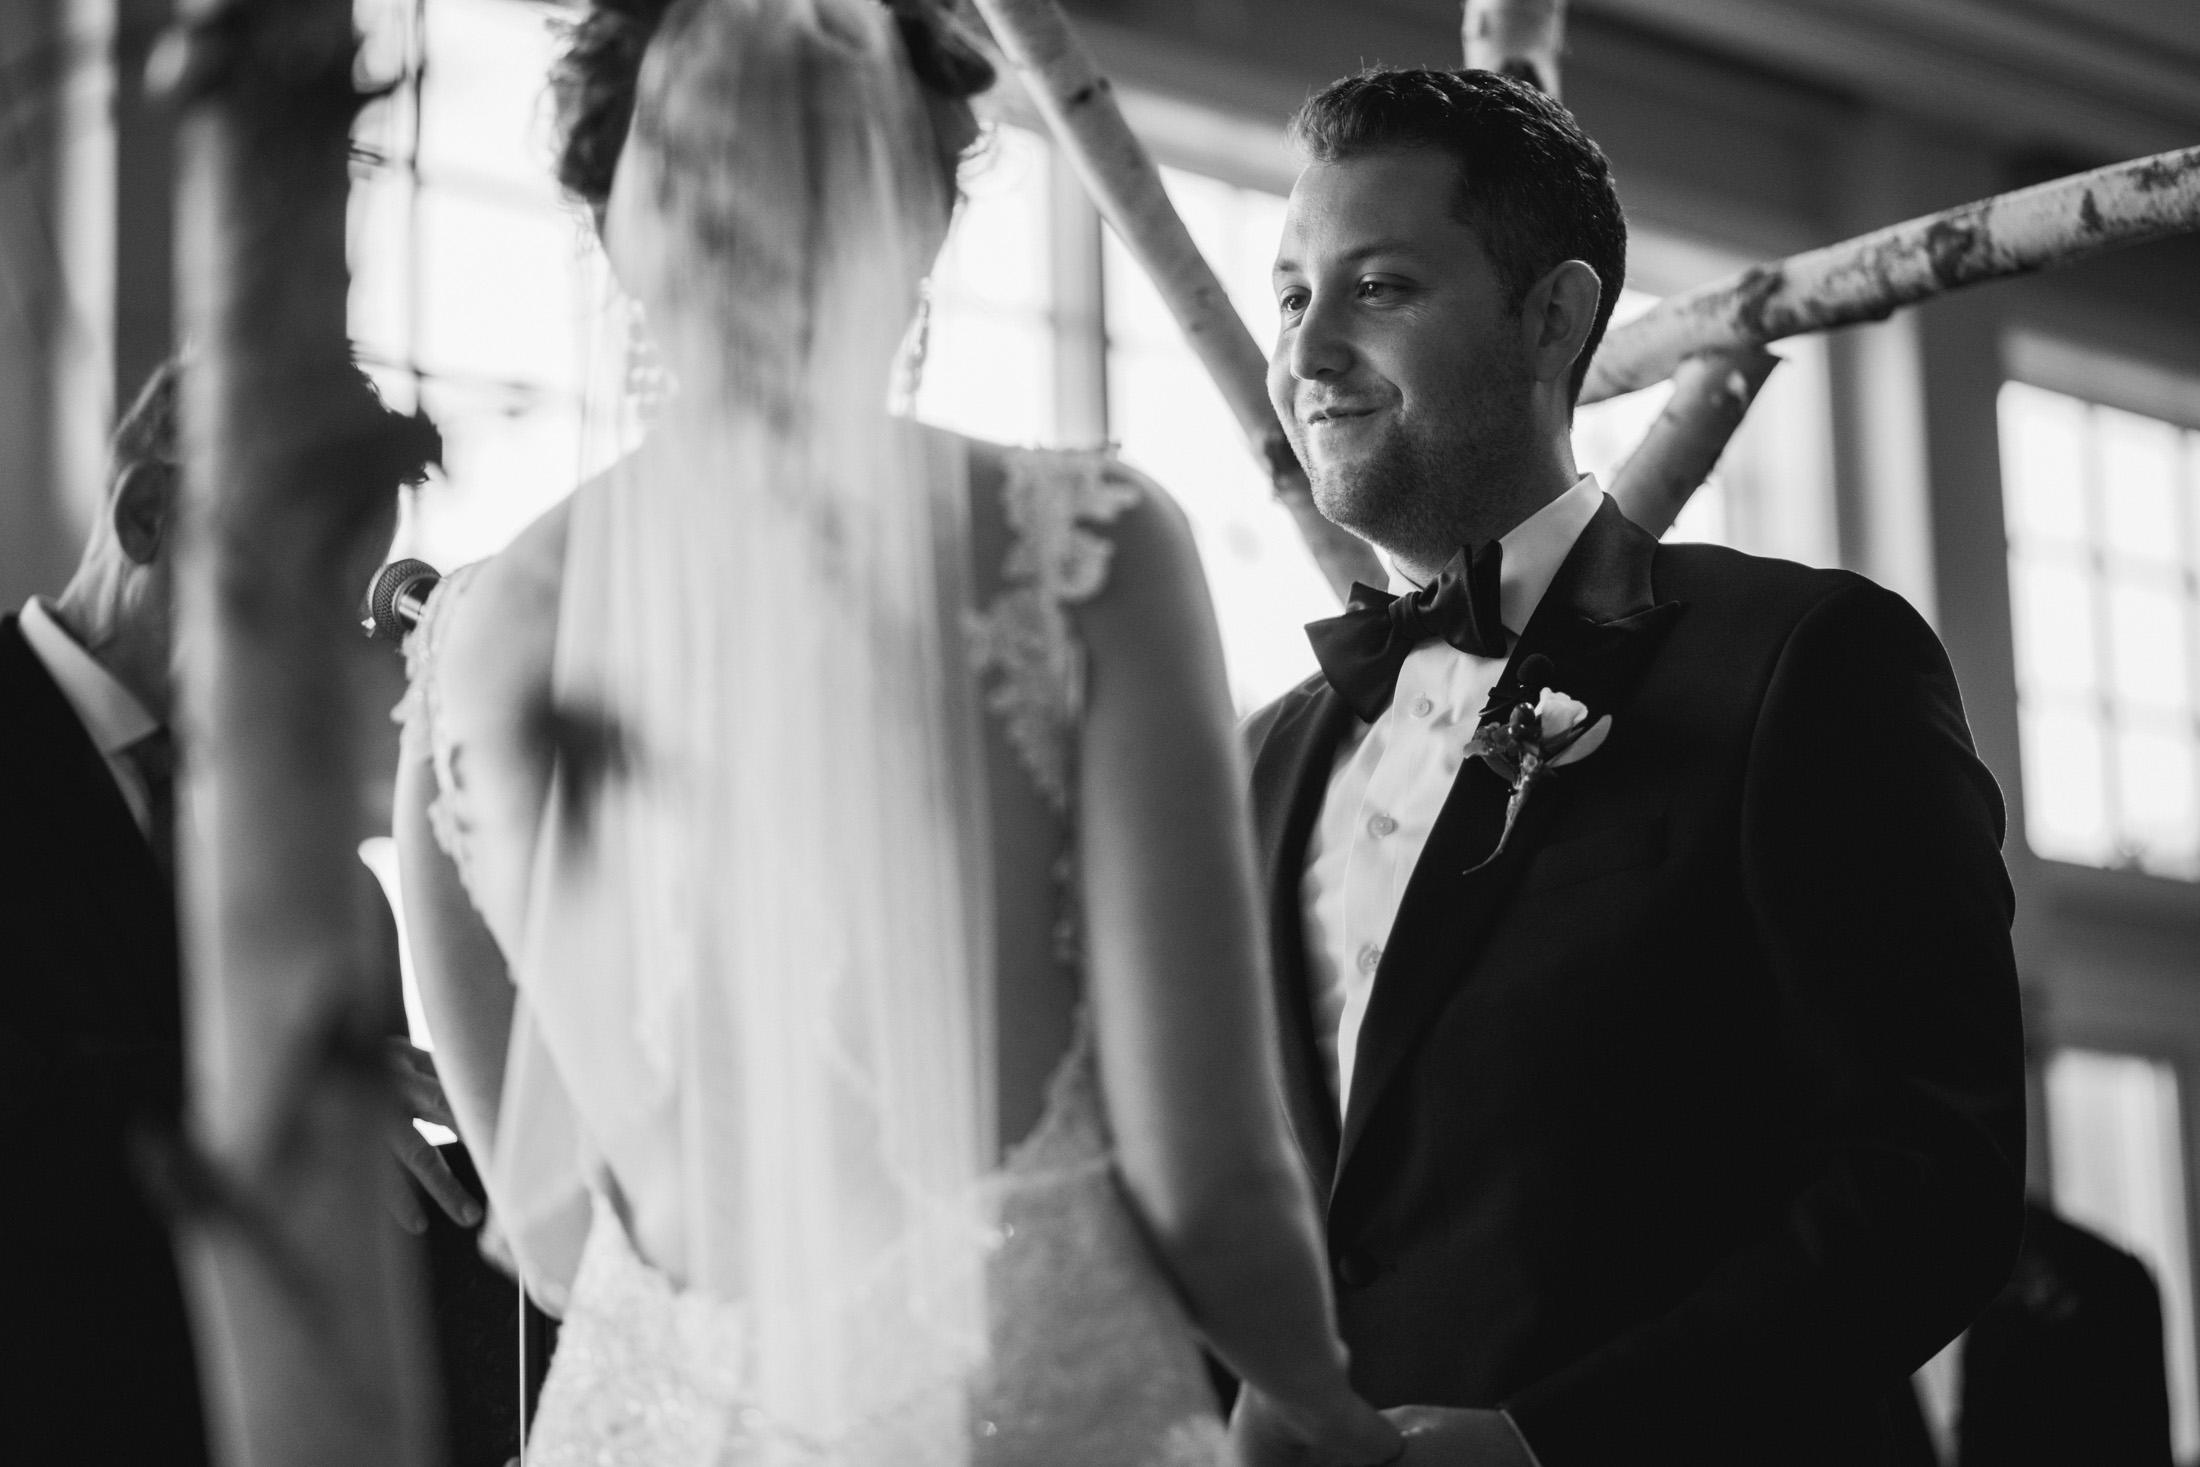 Cruiseport-Wedding-Photographer-14.jpg